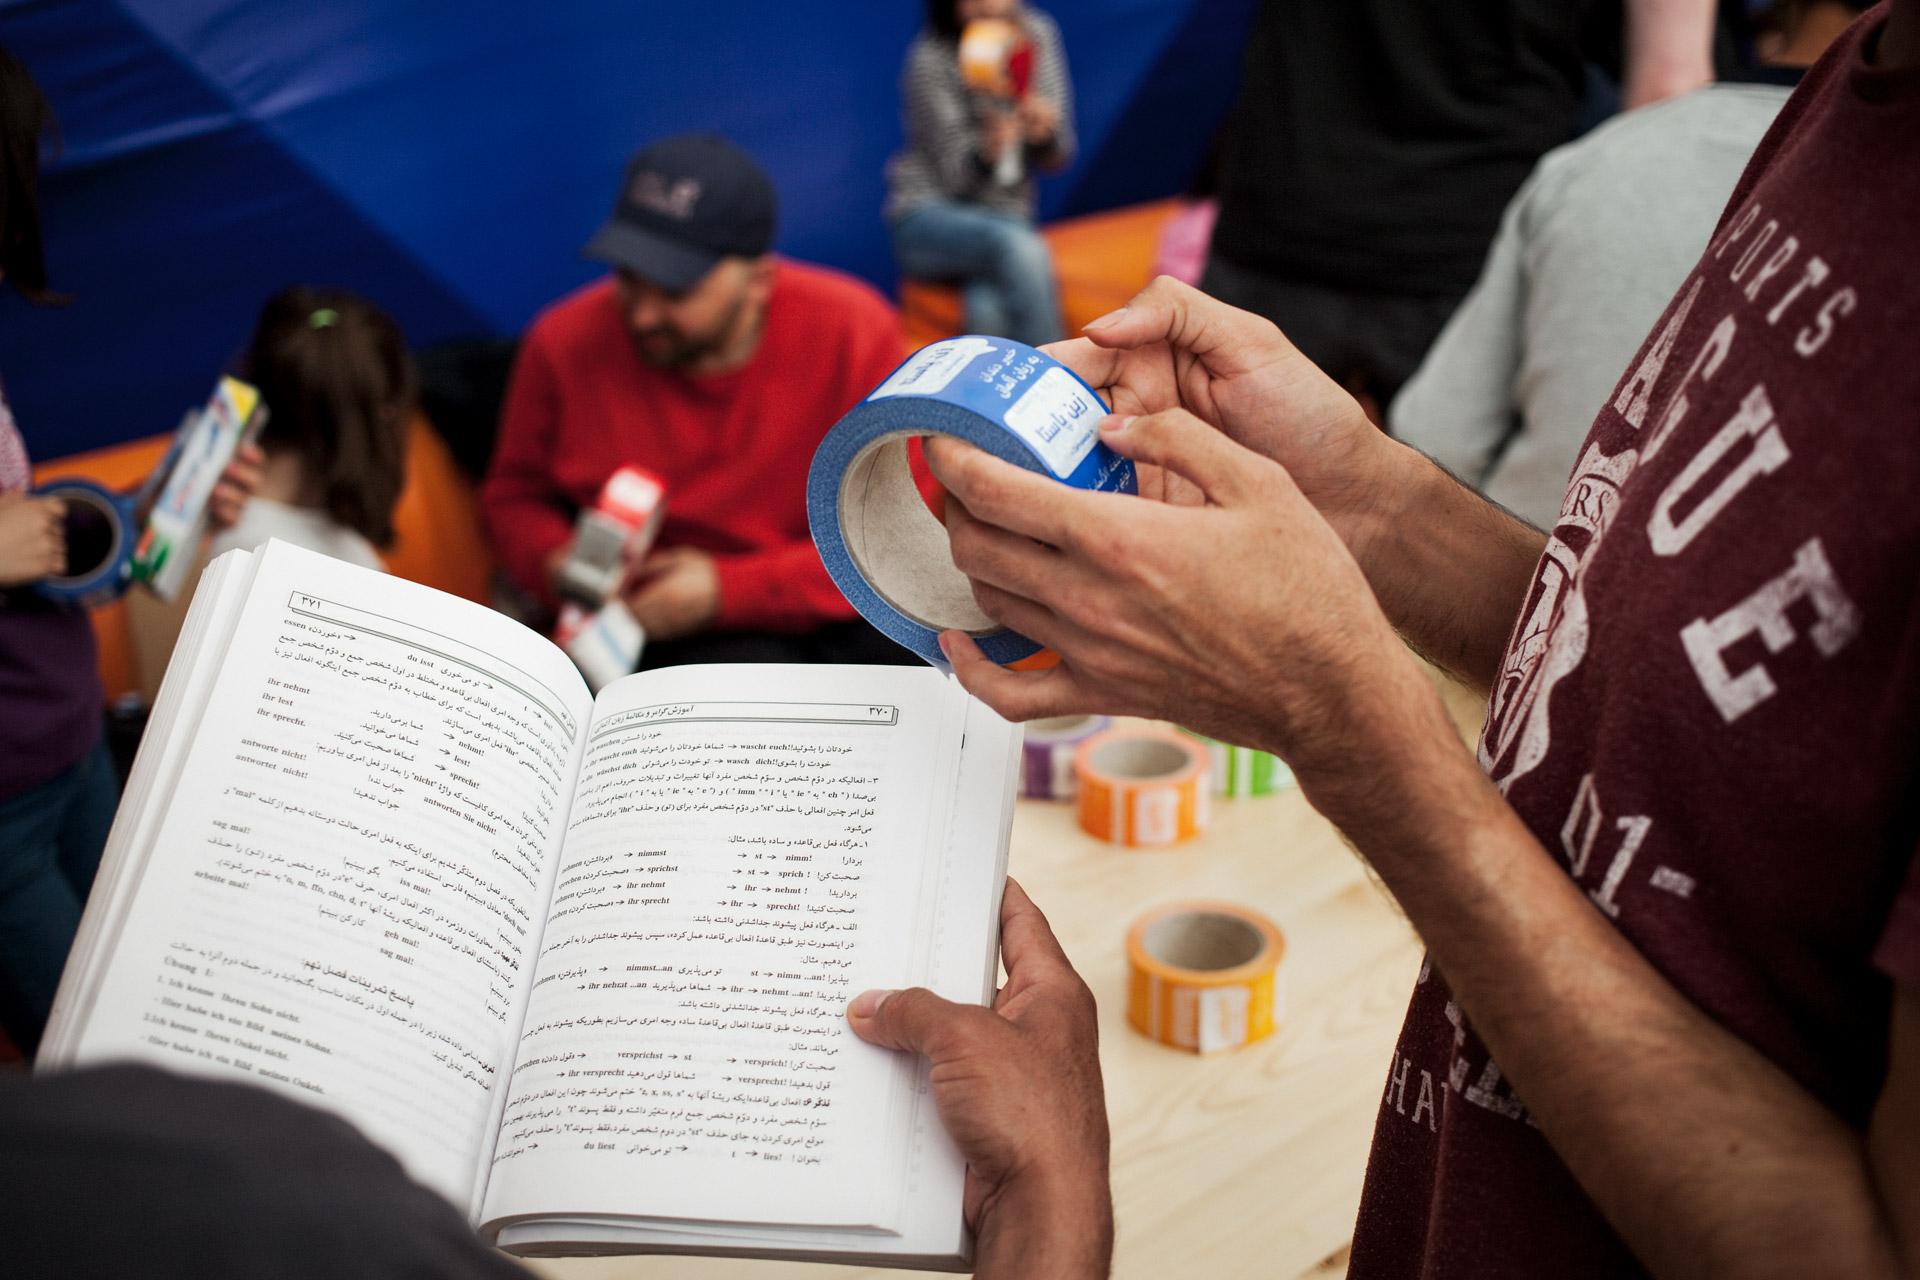 timo-stammberger-photography-fluechtlinge-refugees-berlin-migration-notunterkunft_09